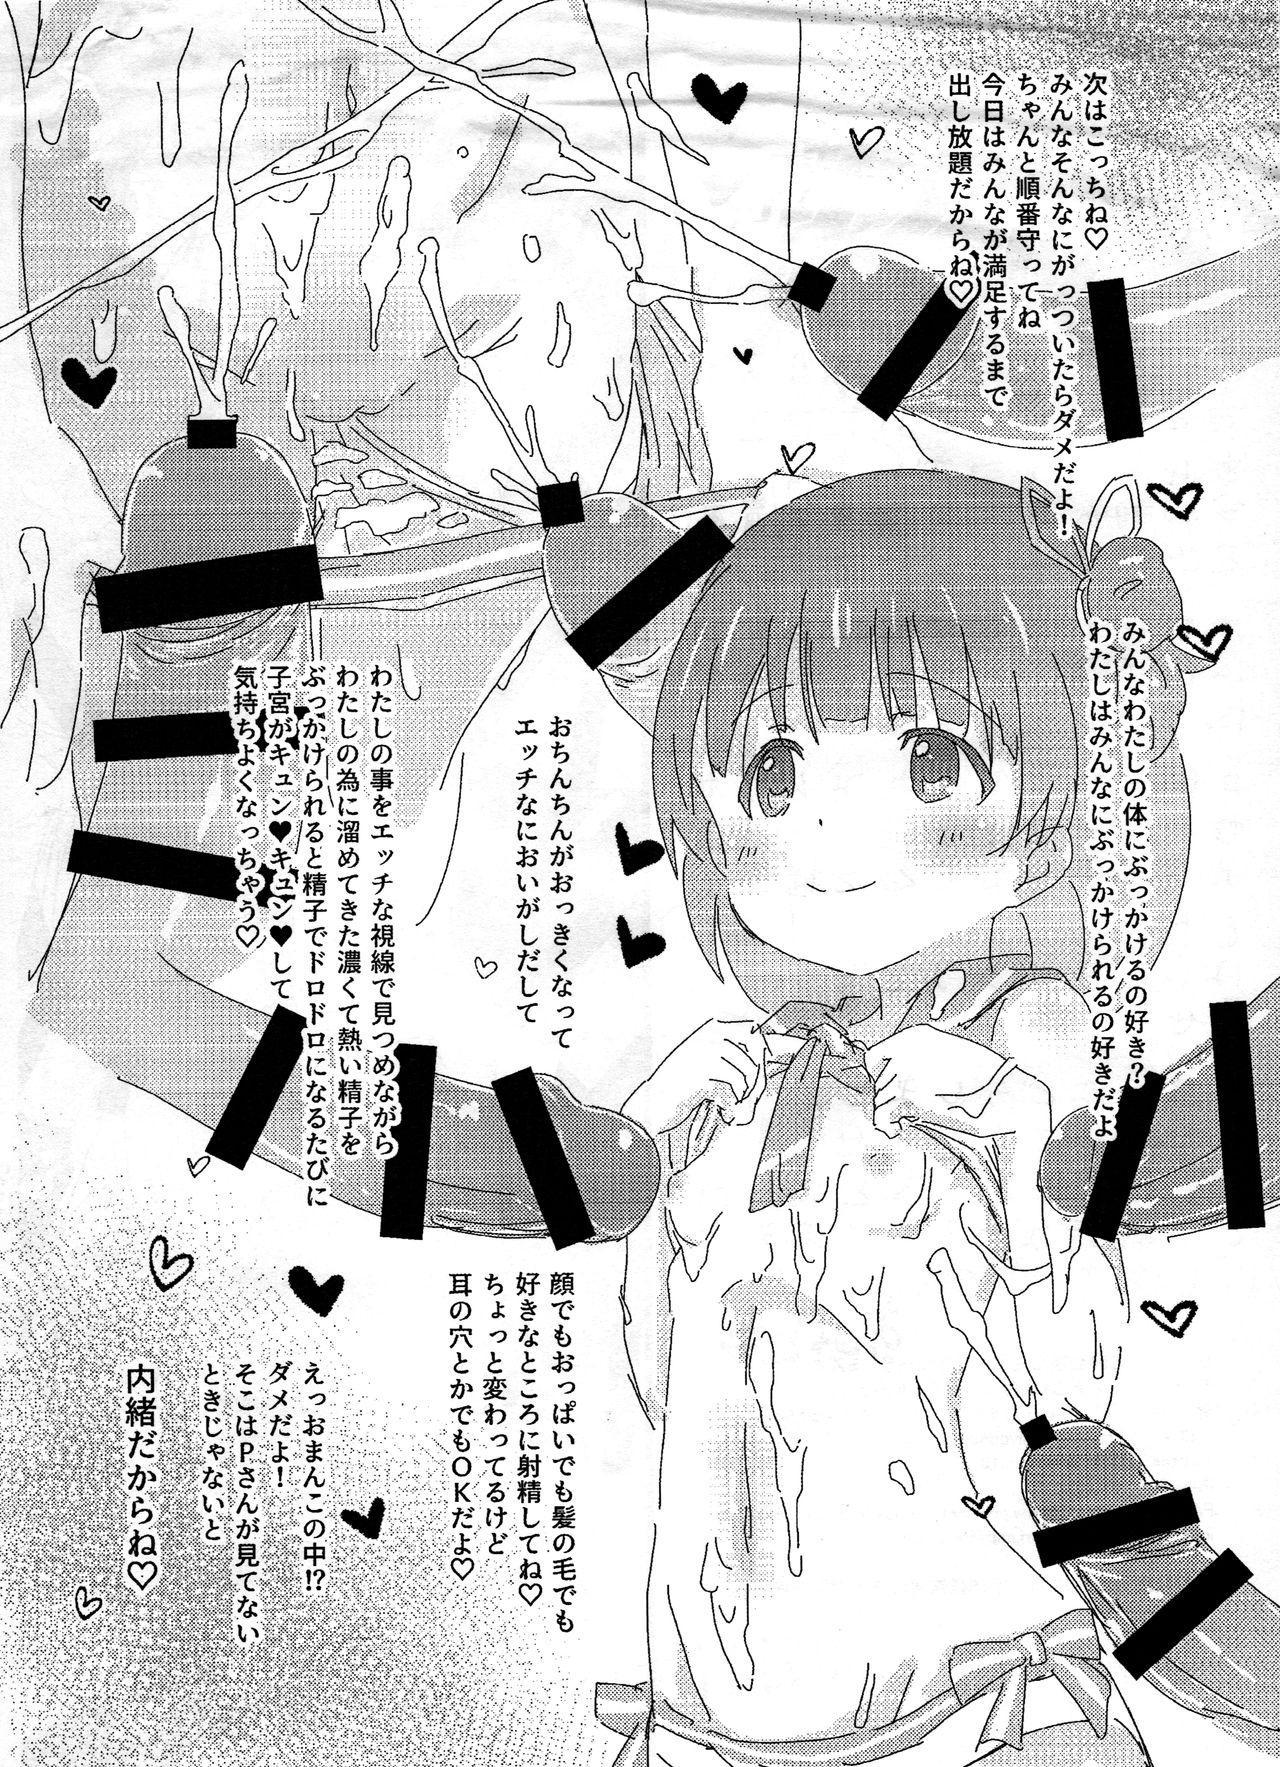 Beautiful Harmony + C96 Kaijou Gentei Omakebon Sailor Mizugi 19